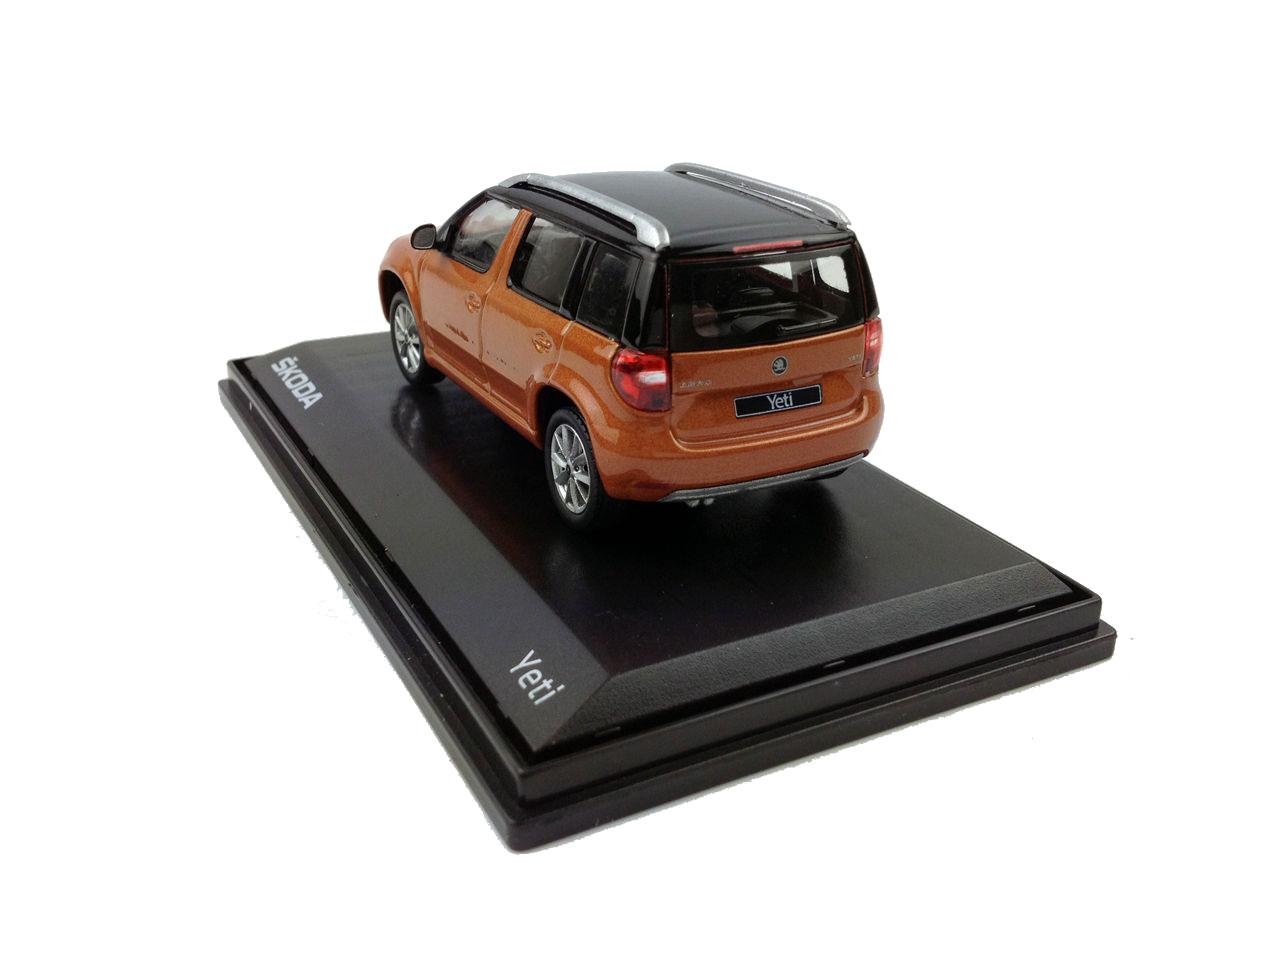 Skoda Yeti 1/43 Scale Diecast Model Car 8